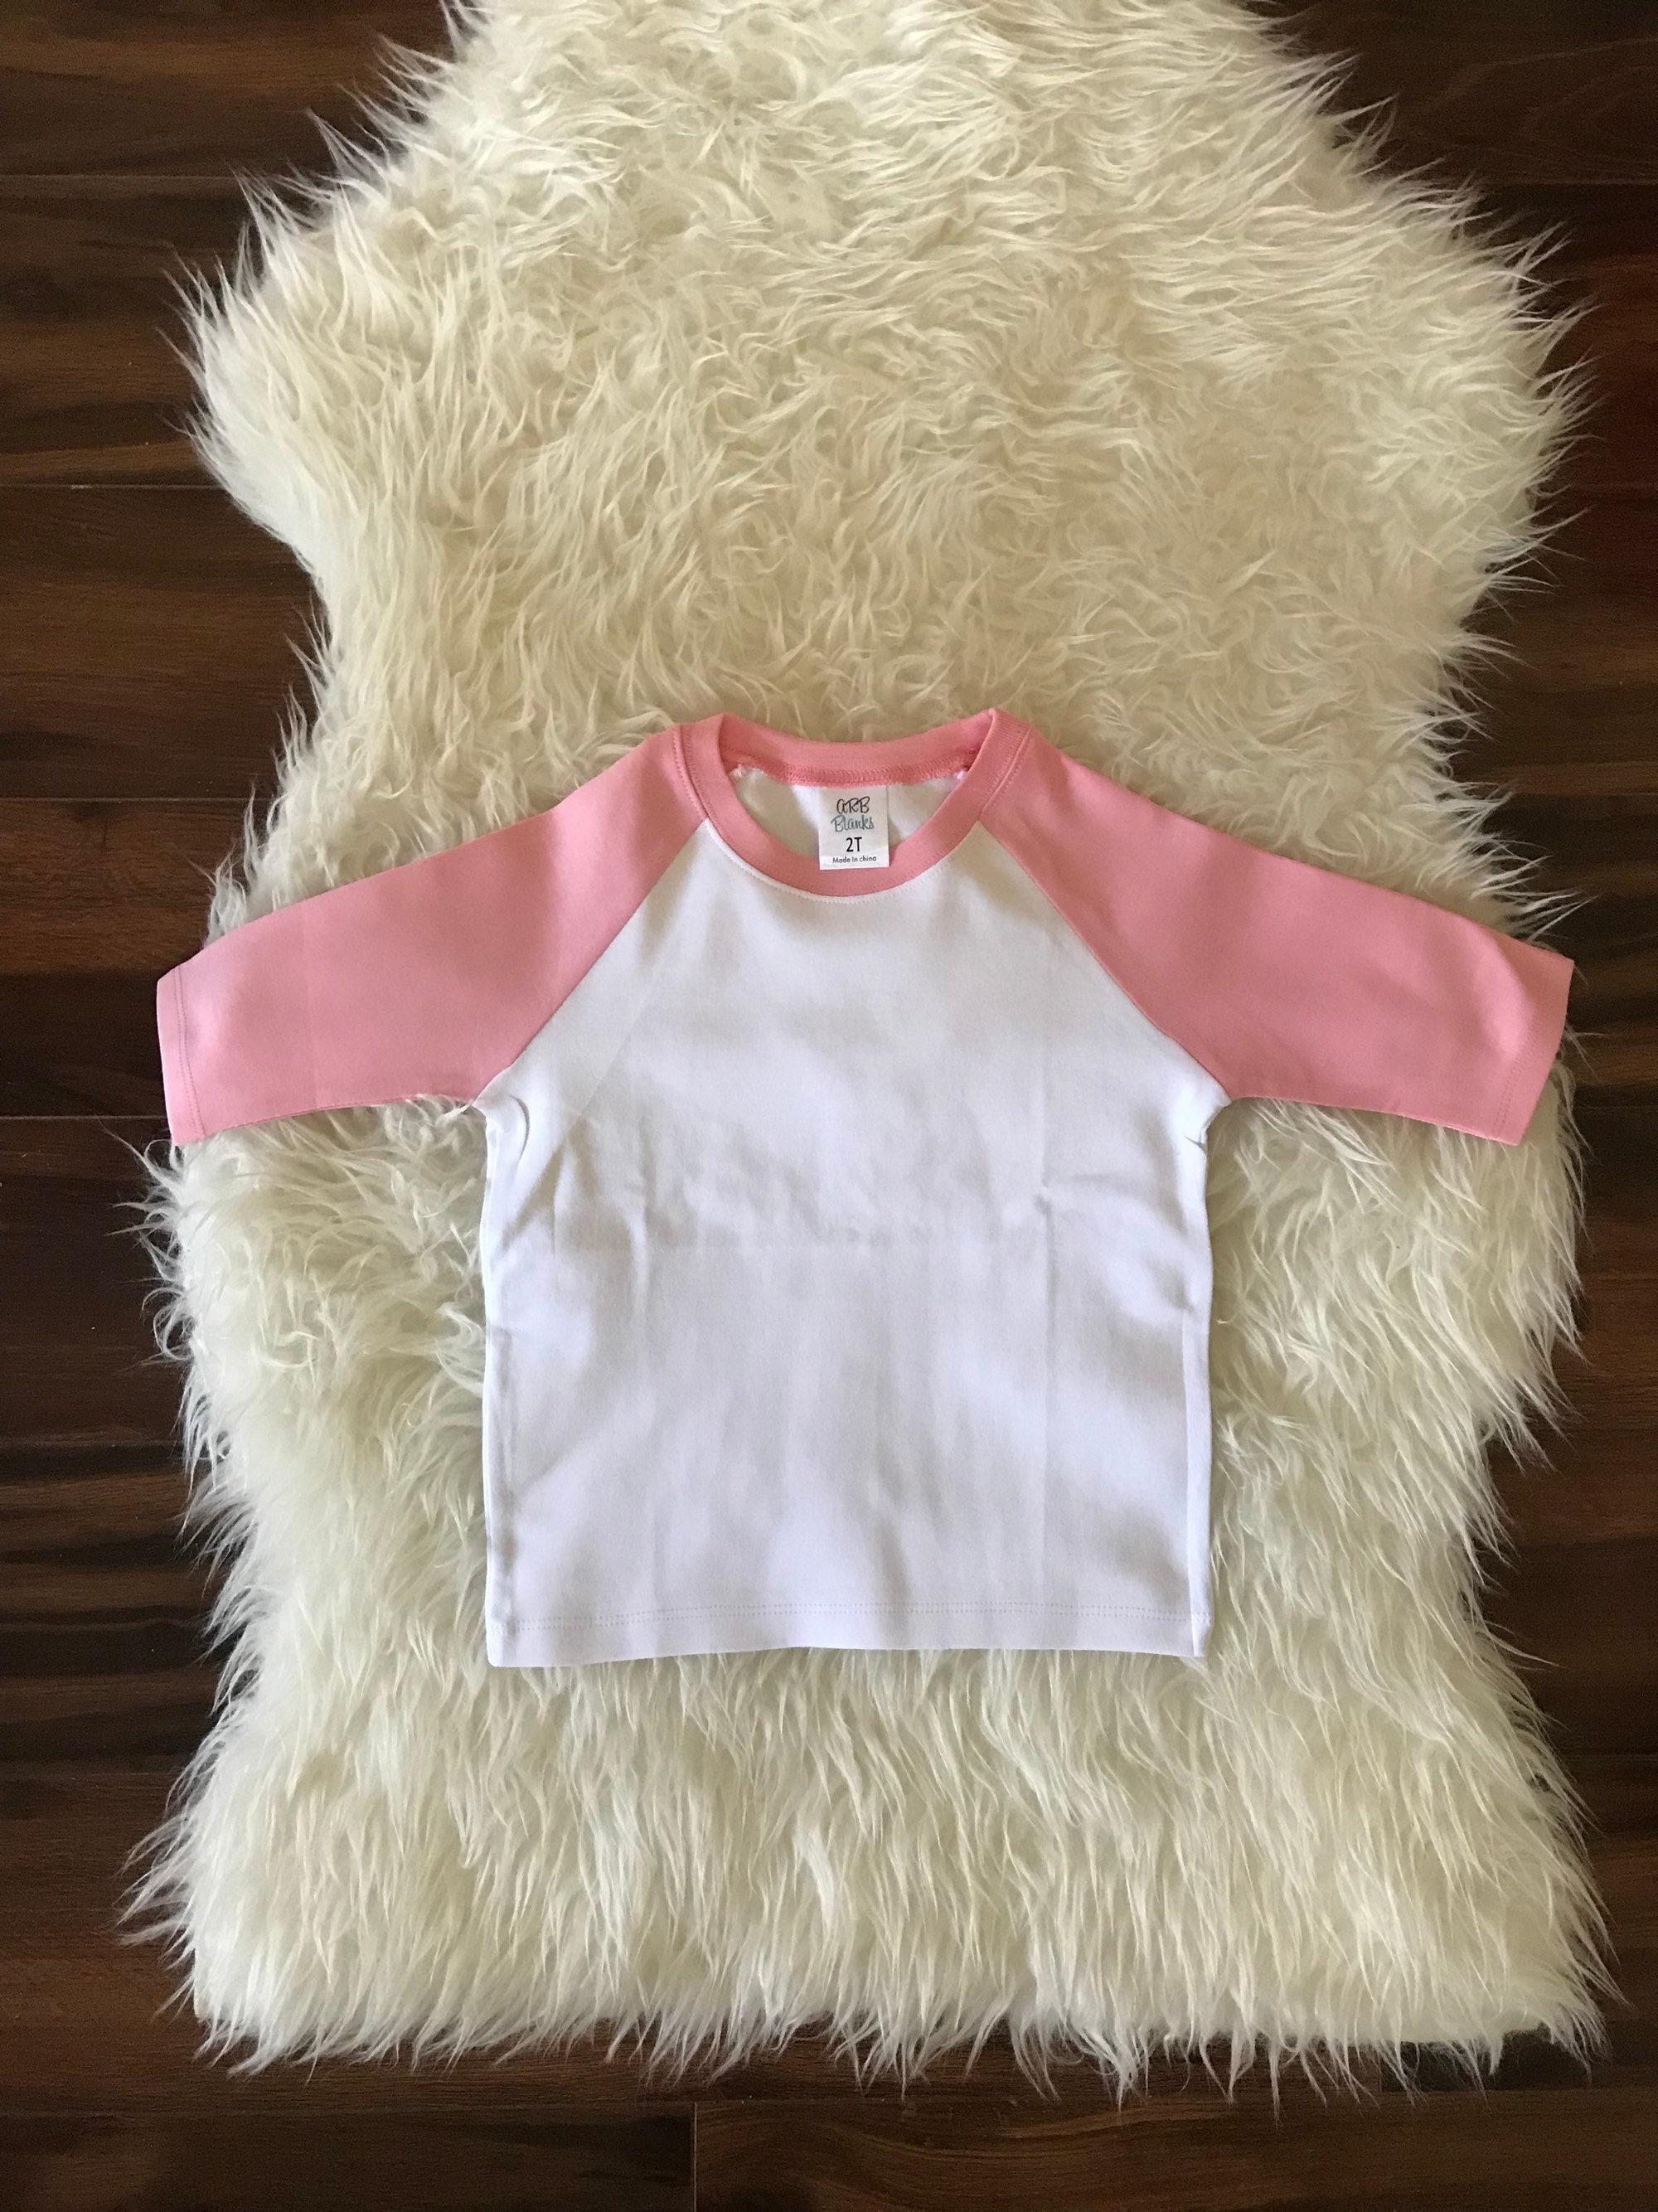 Embroidery Blanks Htv Blanks Blank Raglan Shirt Girl Raglan Etsy